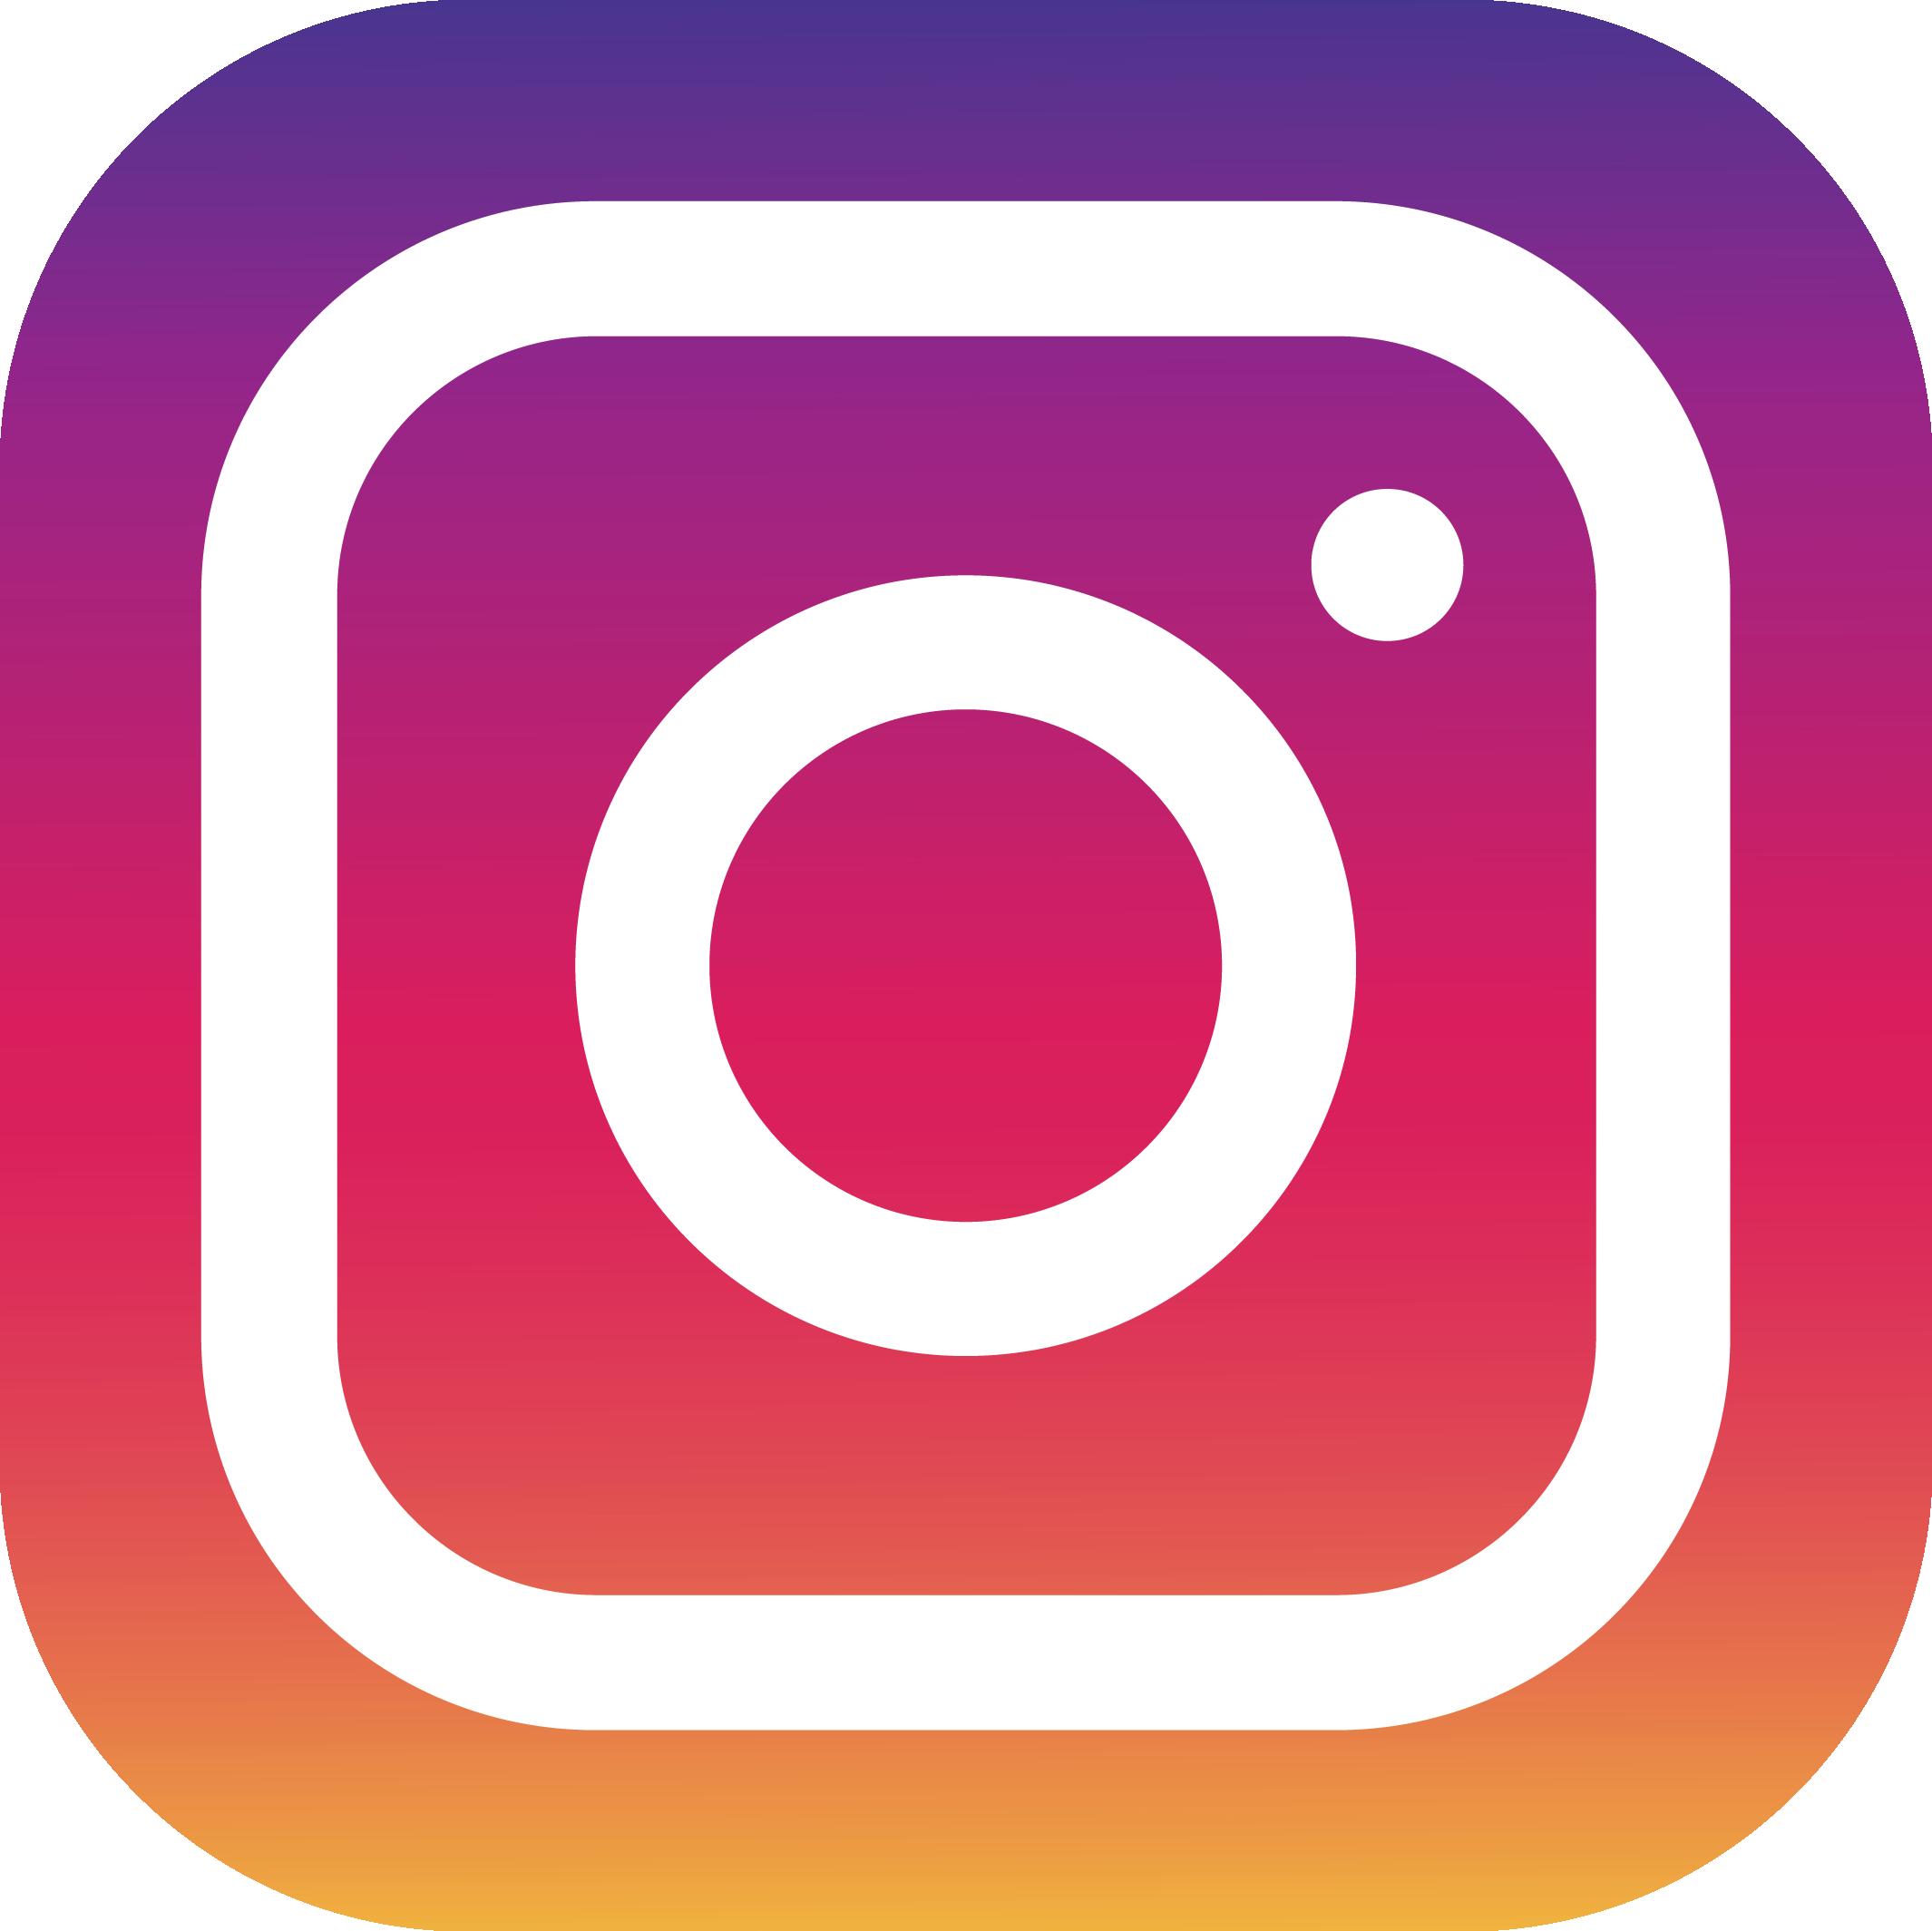 Vieni a trovarci su Instagram